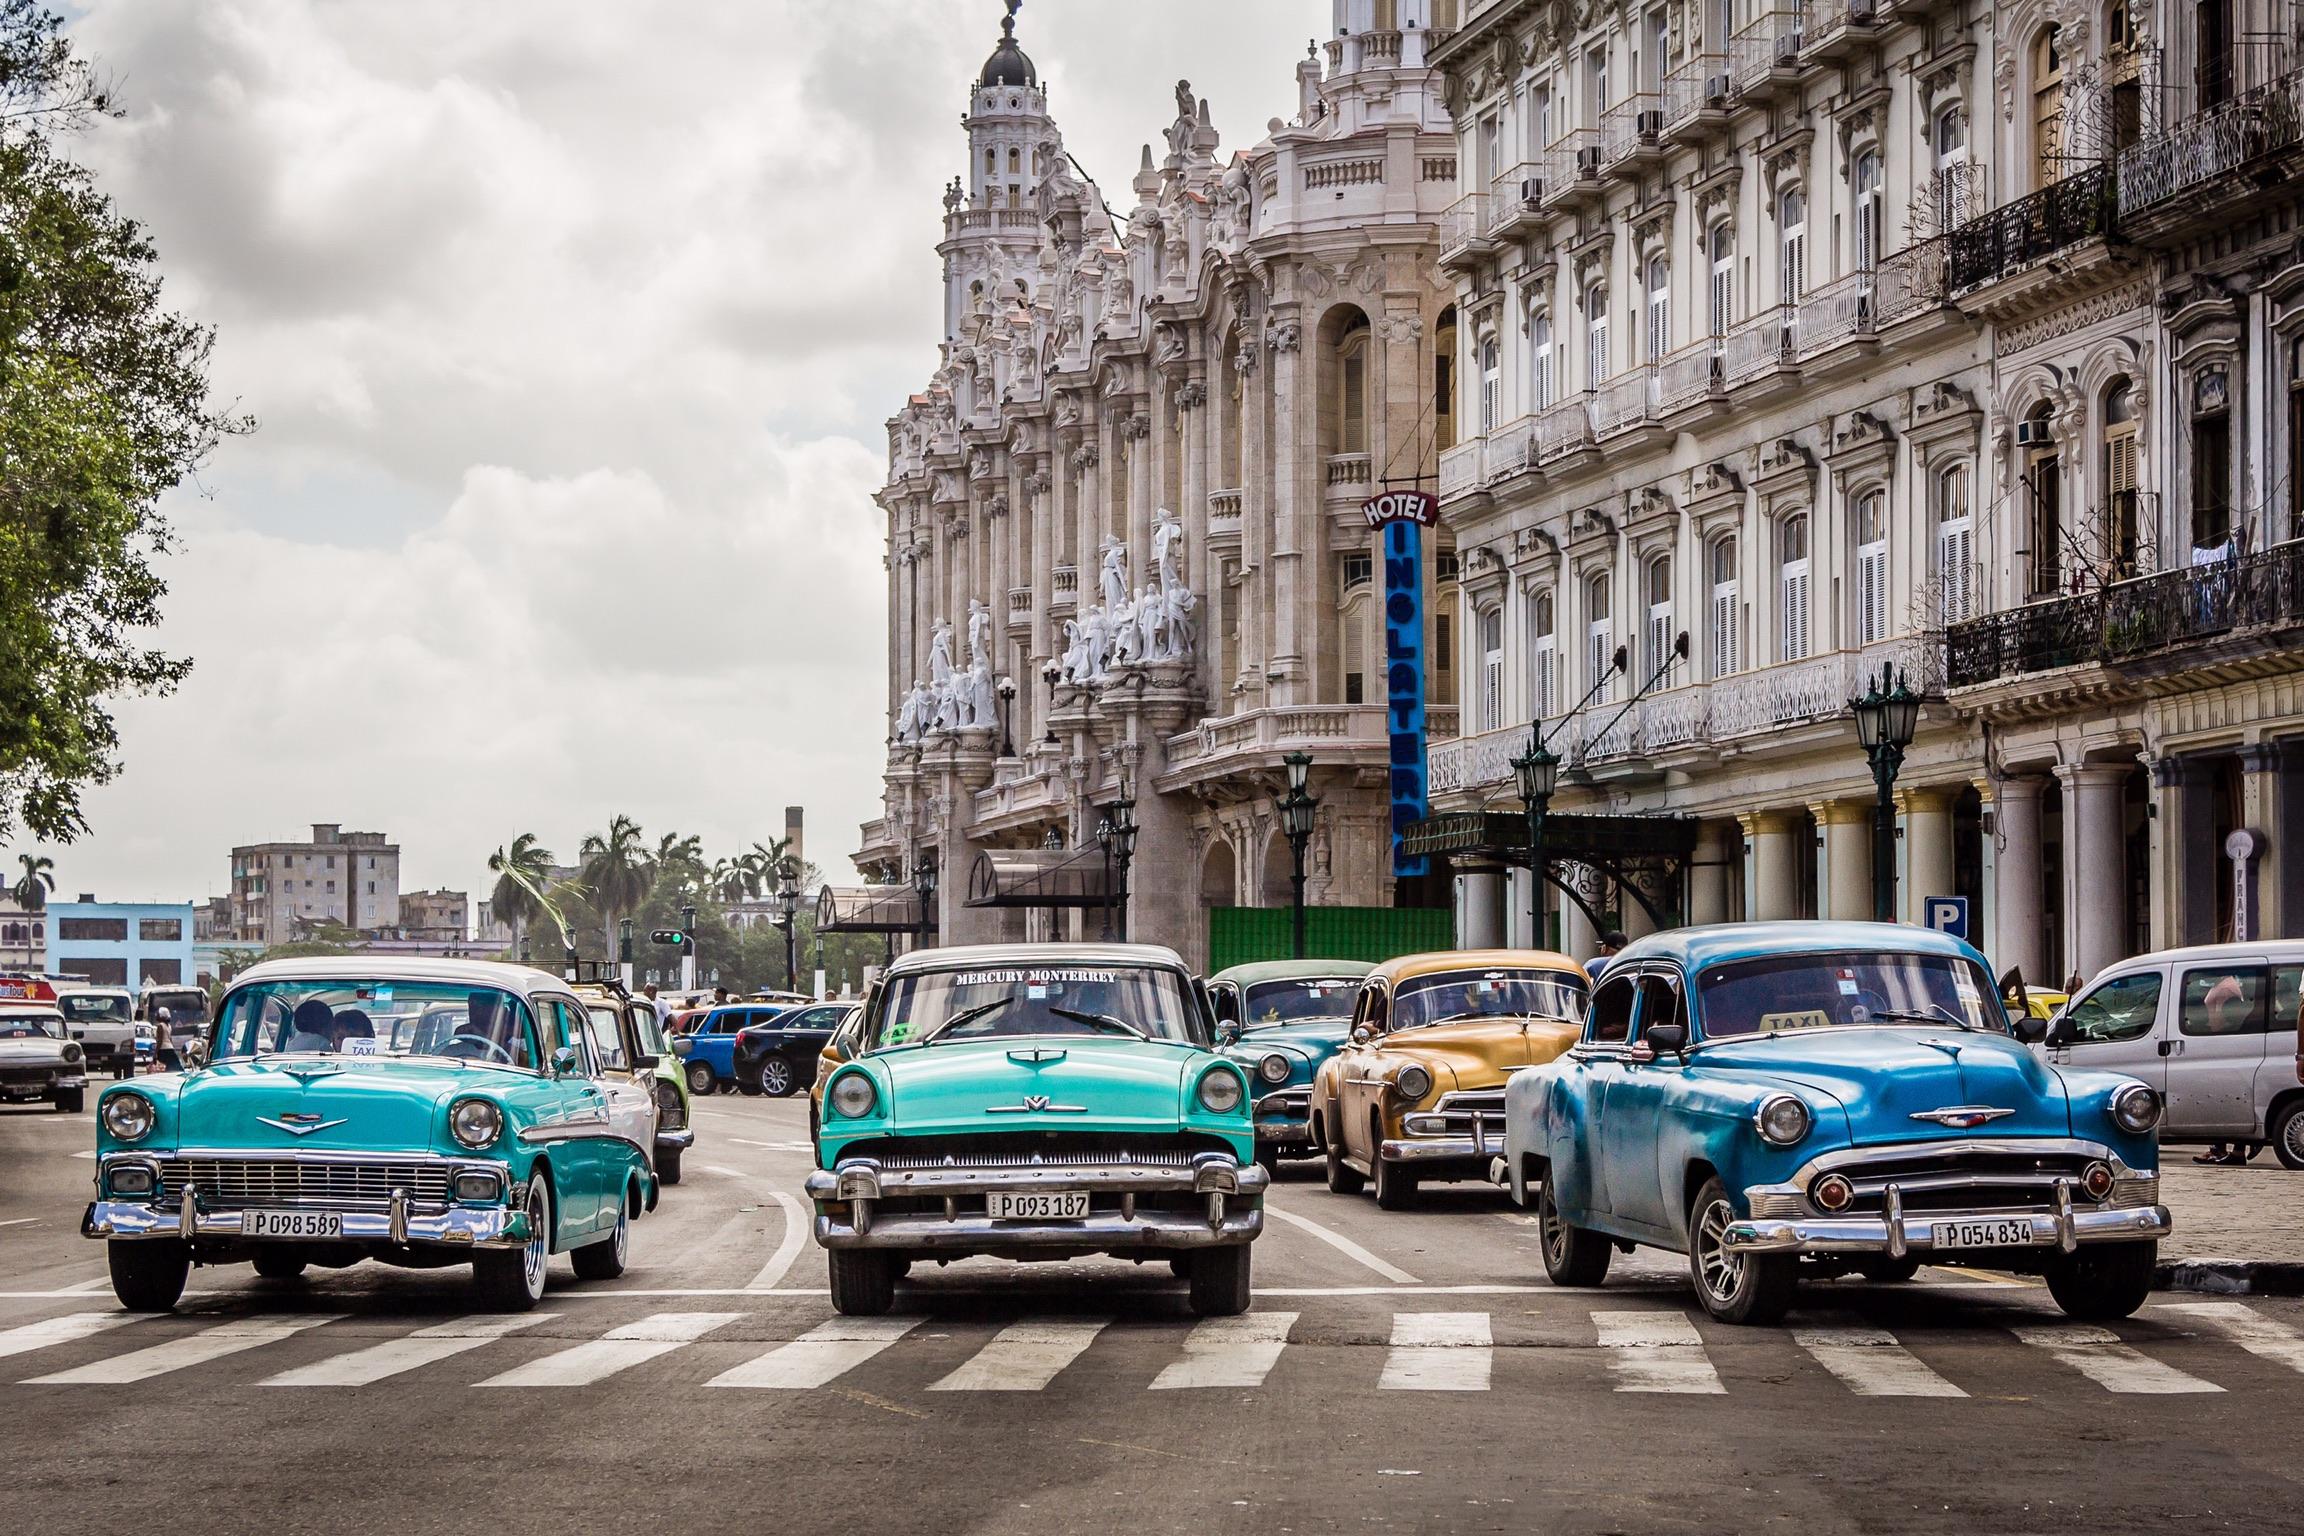 Blubber, blubber. Havanna 2015